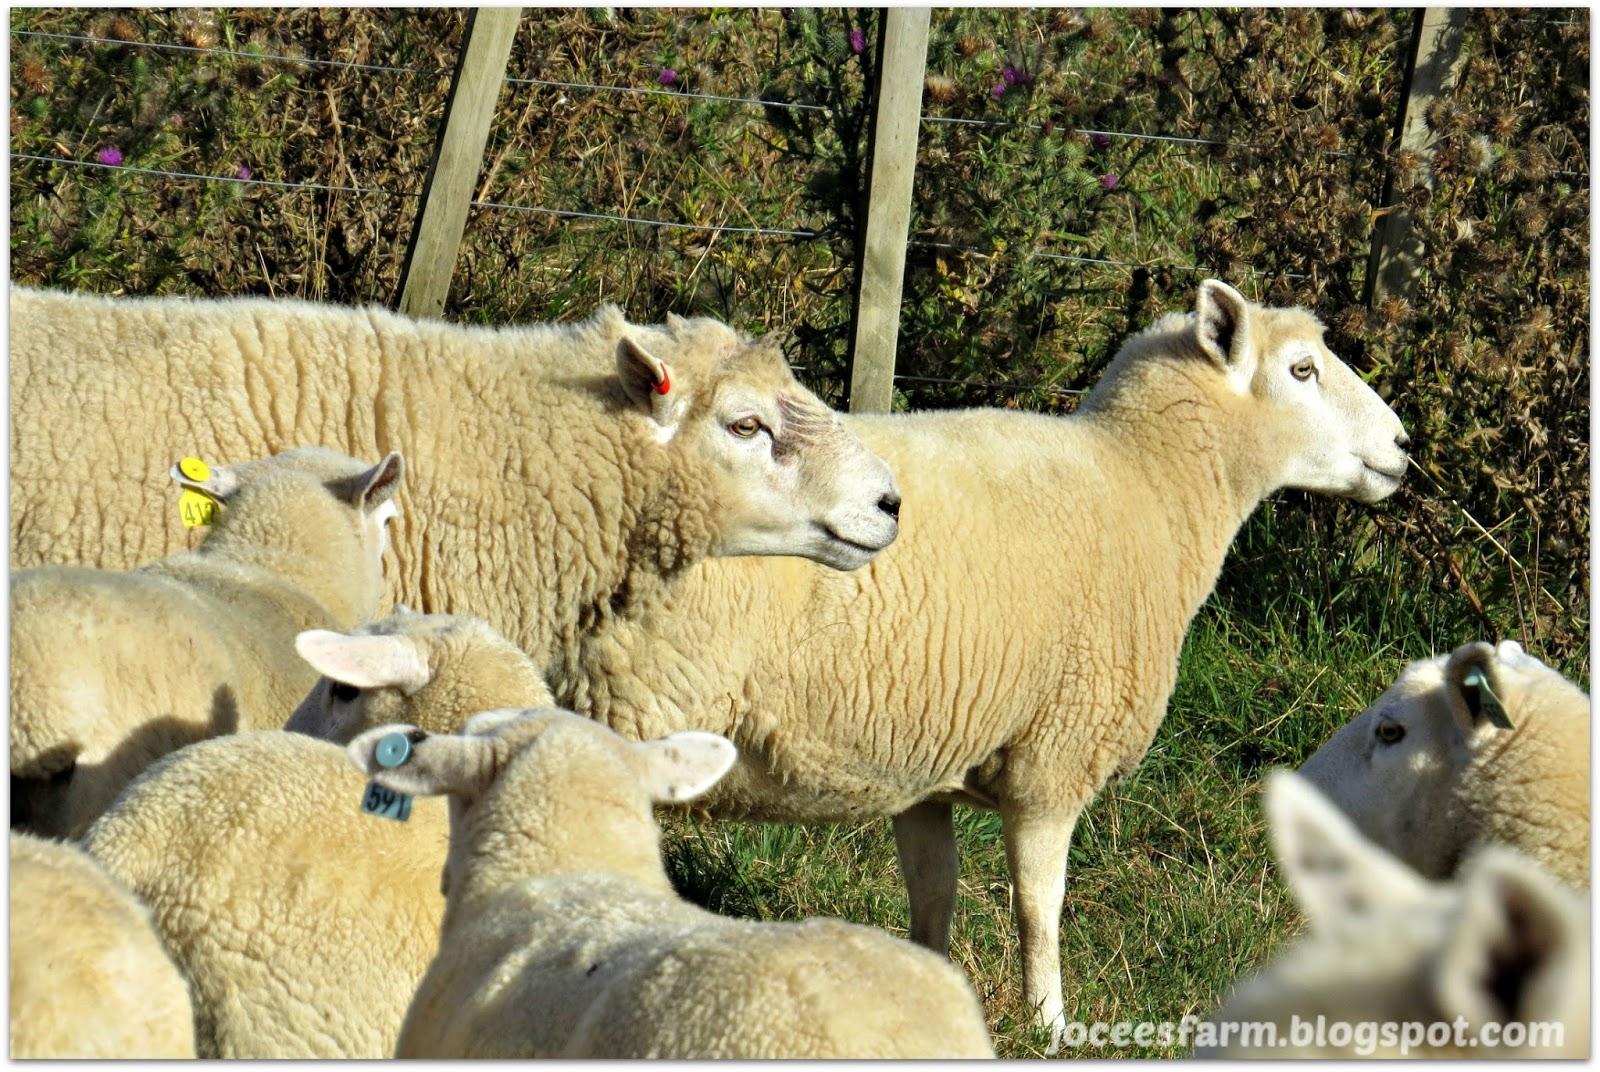 Ram time  -  @joceesfarm.blogspot.com